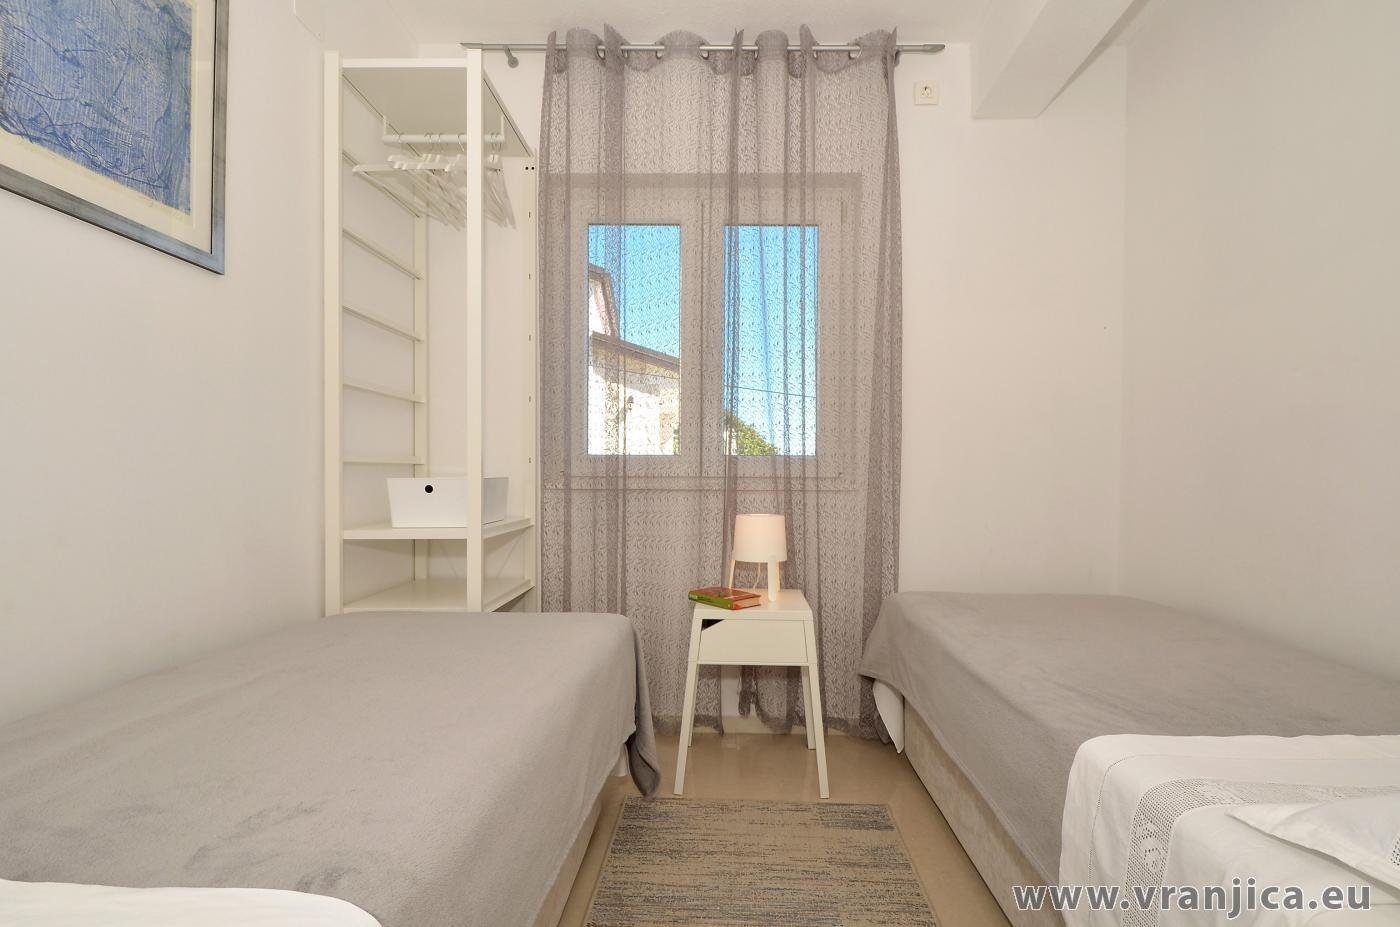 https://www.vranjica.eu/pokoje/apartman-inge-ap2-4-1-1572992363L.jpg